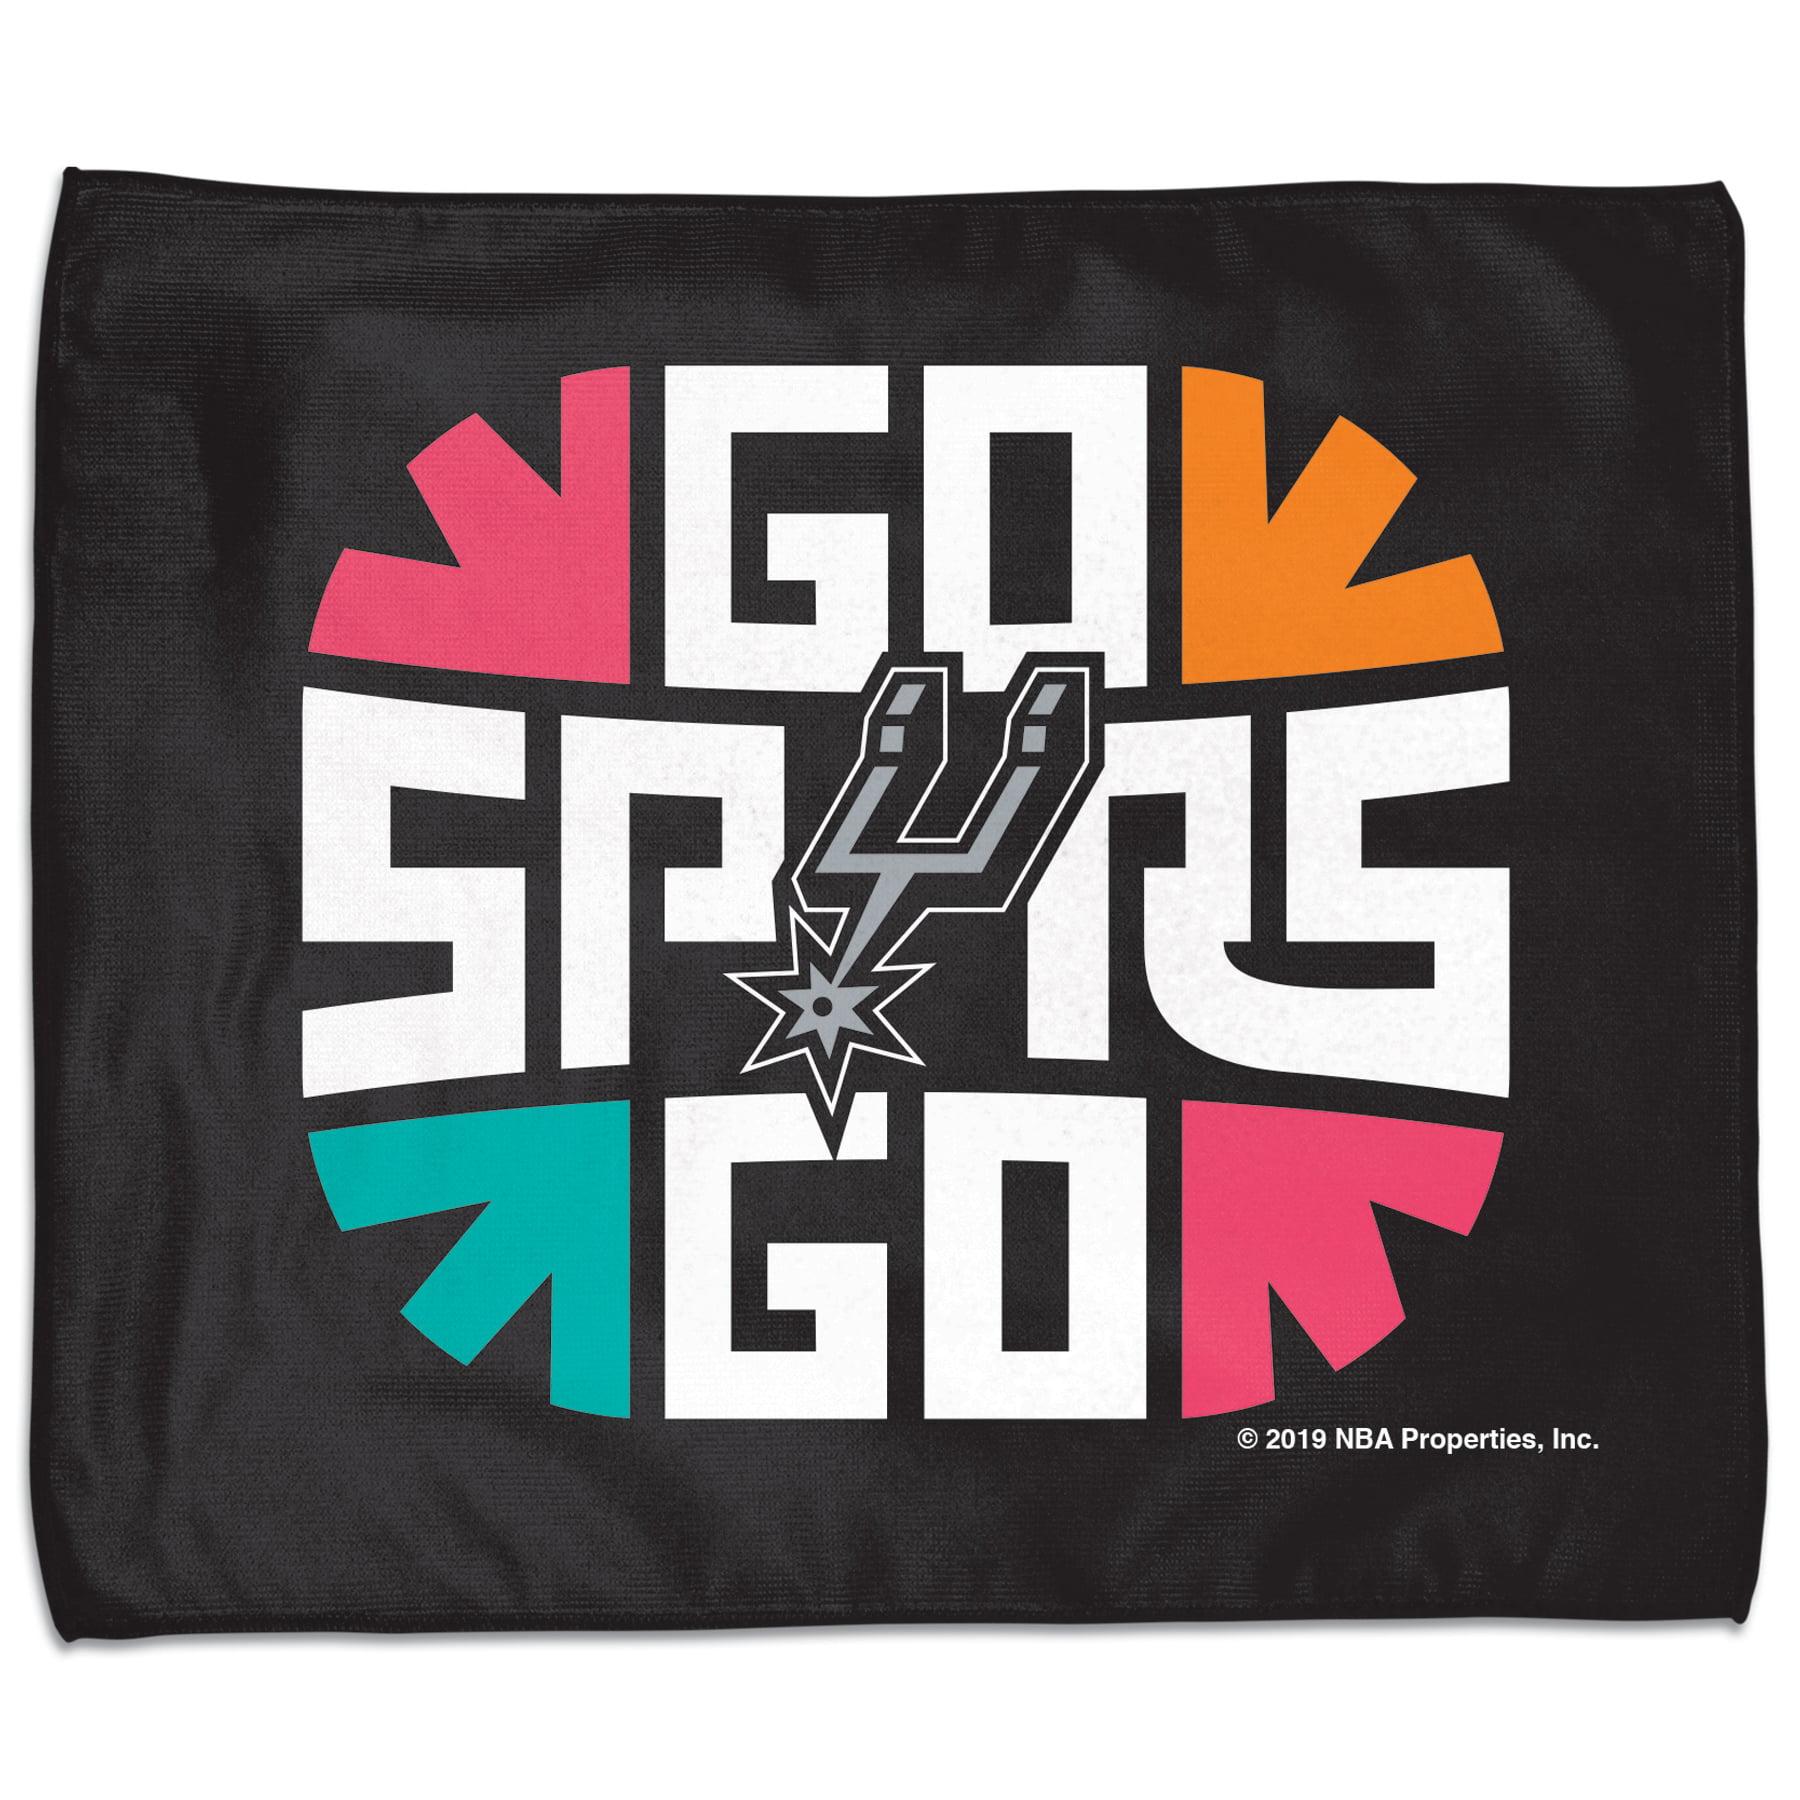 San Antonio Spurs WinCraft 2019 NBA Playoffs Bound 15'' x 18'' Slogan Rally Towel - No Size